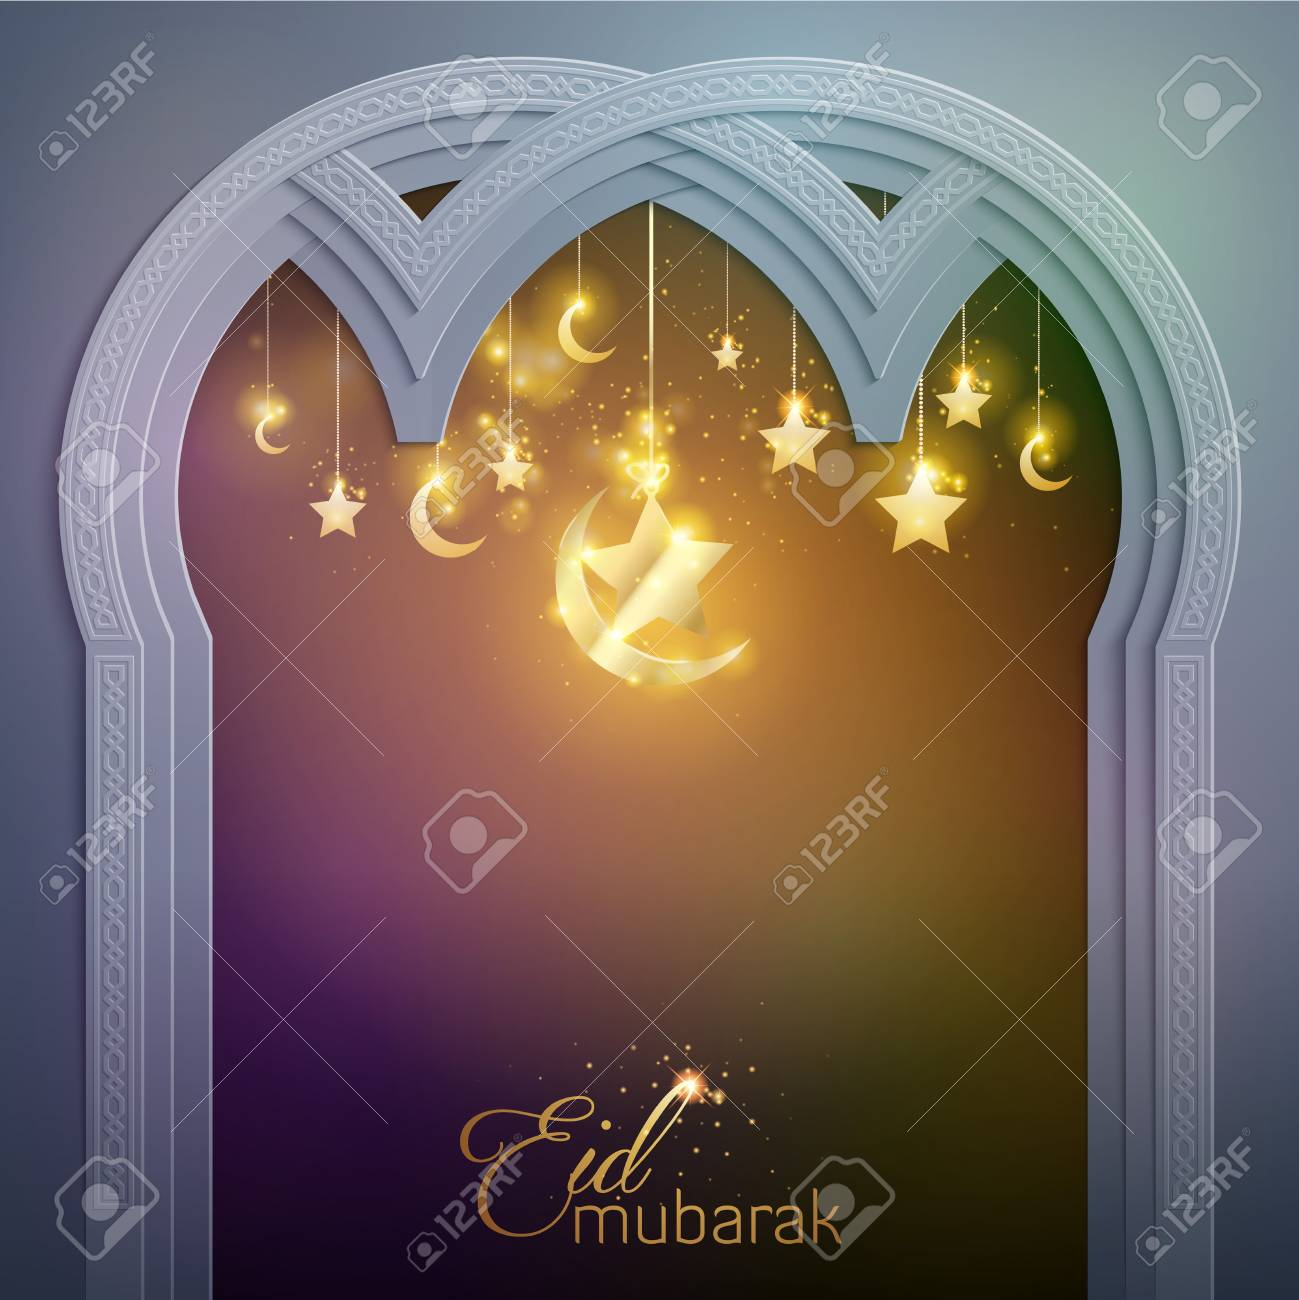 Islamic Design Greeting Card Template Eid Mubarak Royalty Free